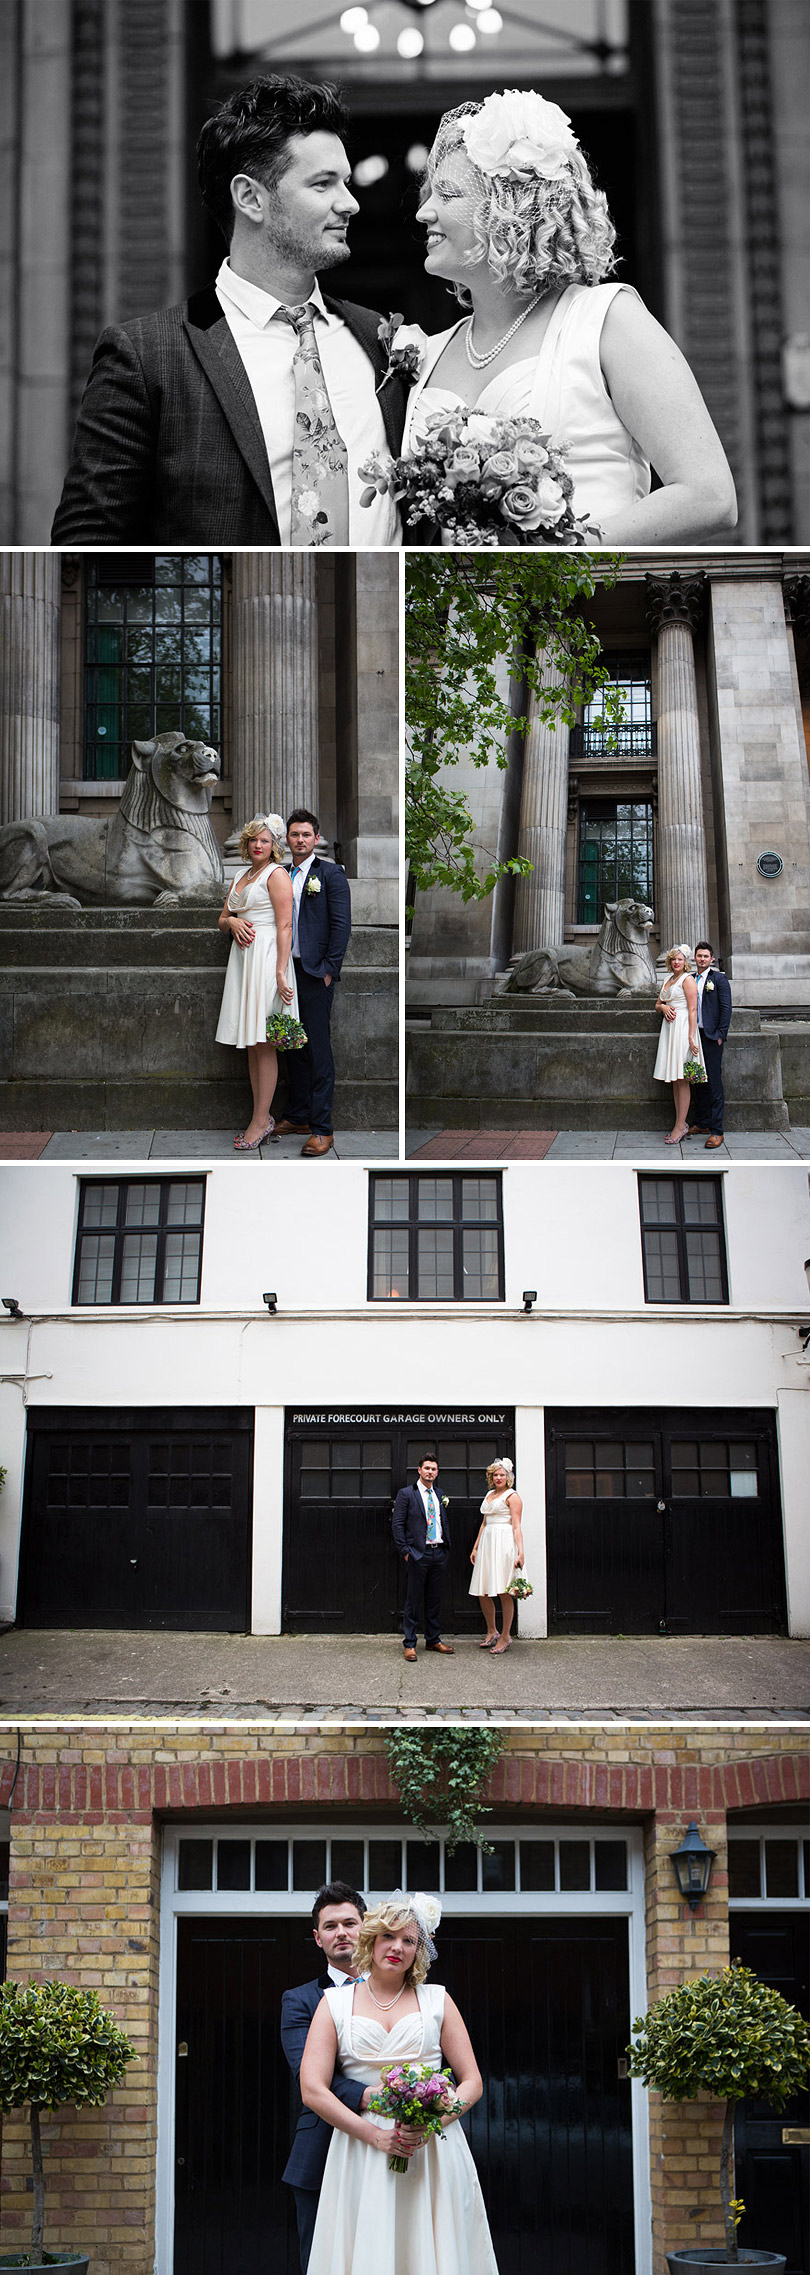 Ben-&-Dee-London-Wedding-310.jpg